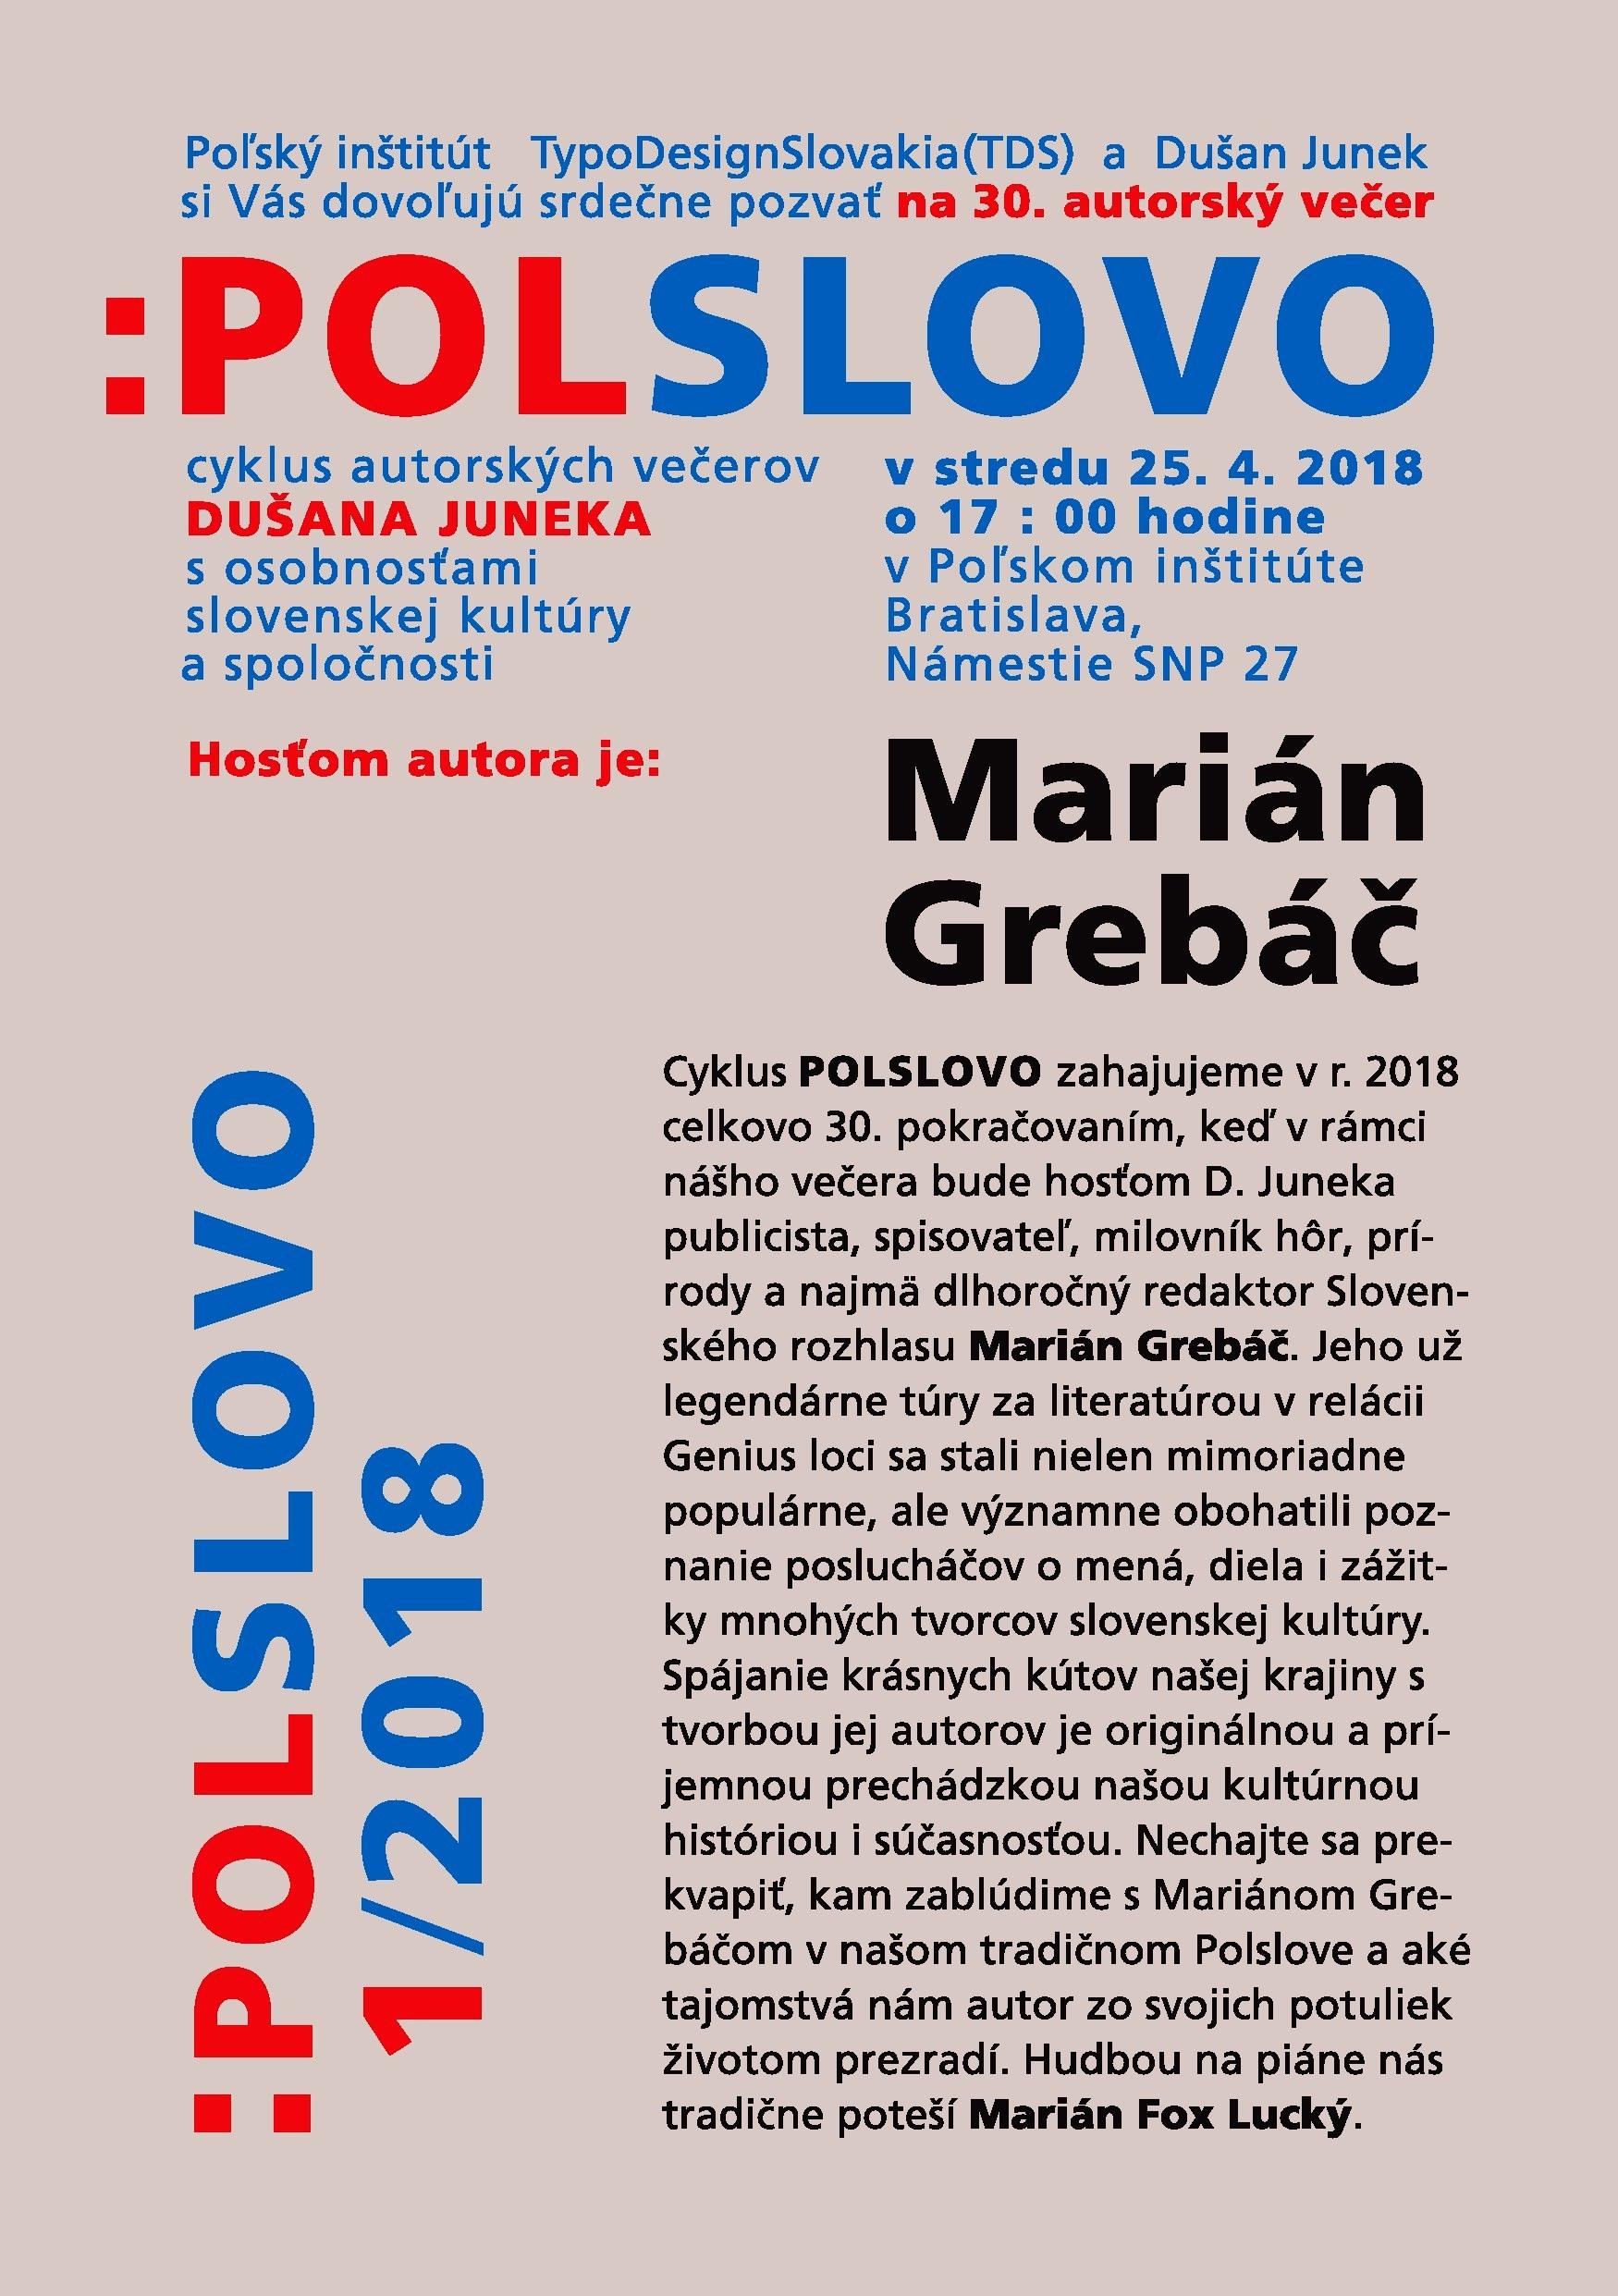 Polslovo-Grebac